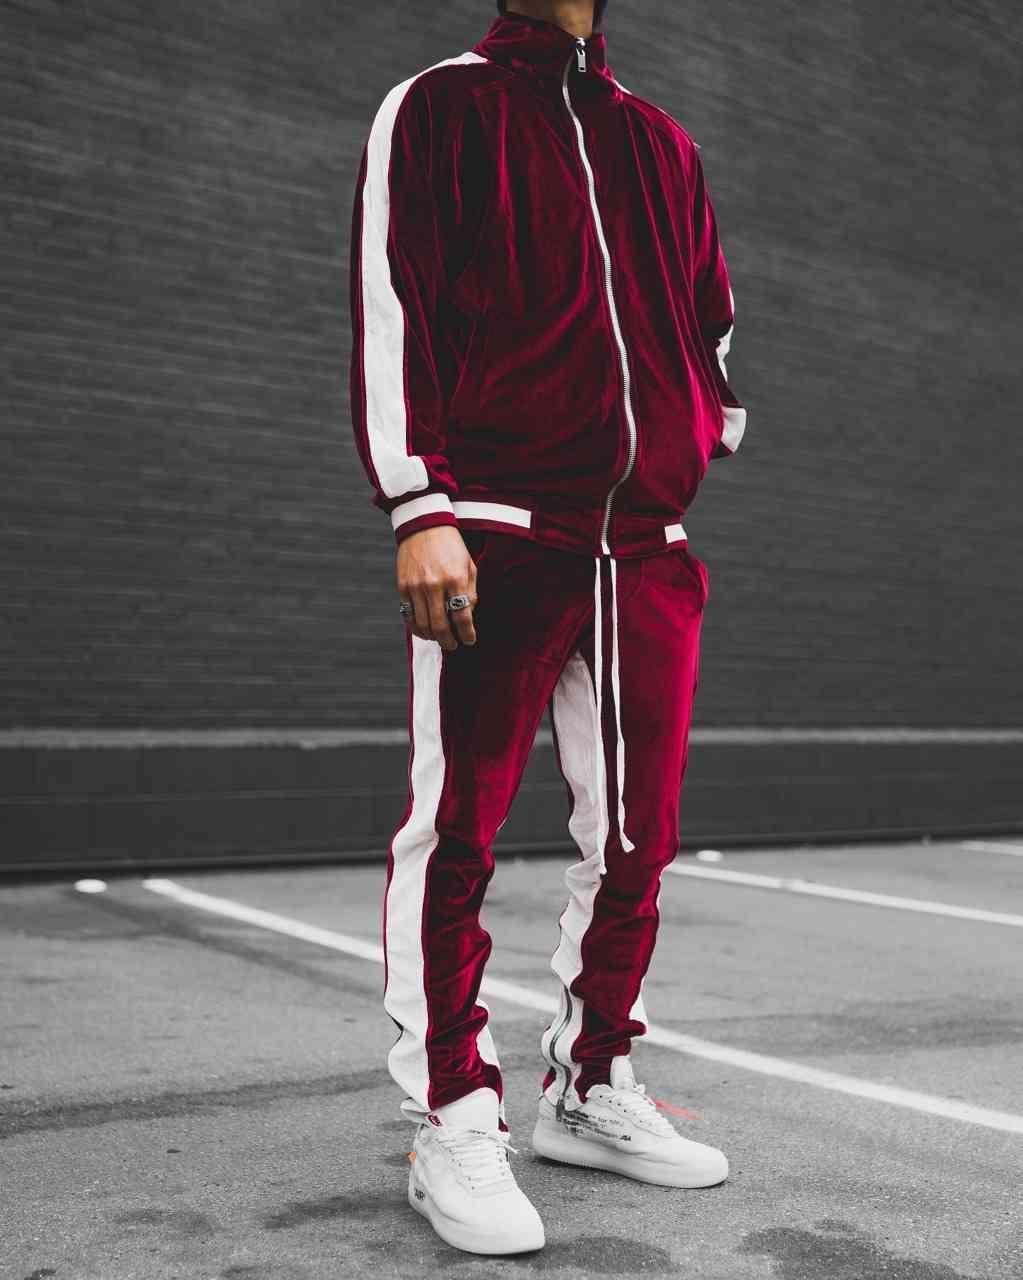 Velvet Mens Designer Tracksuits Street Sports Styles Fashion Panelled Zipper Coat Long Pants Set Male Clothing